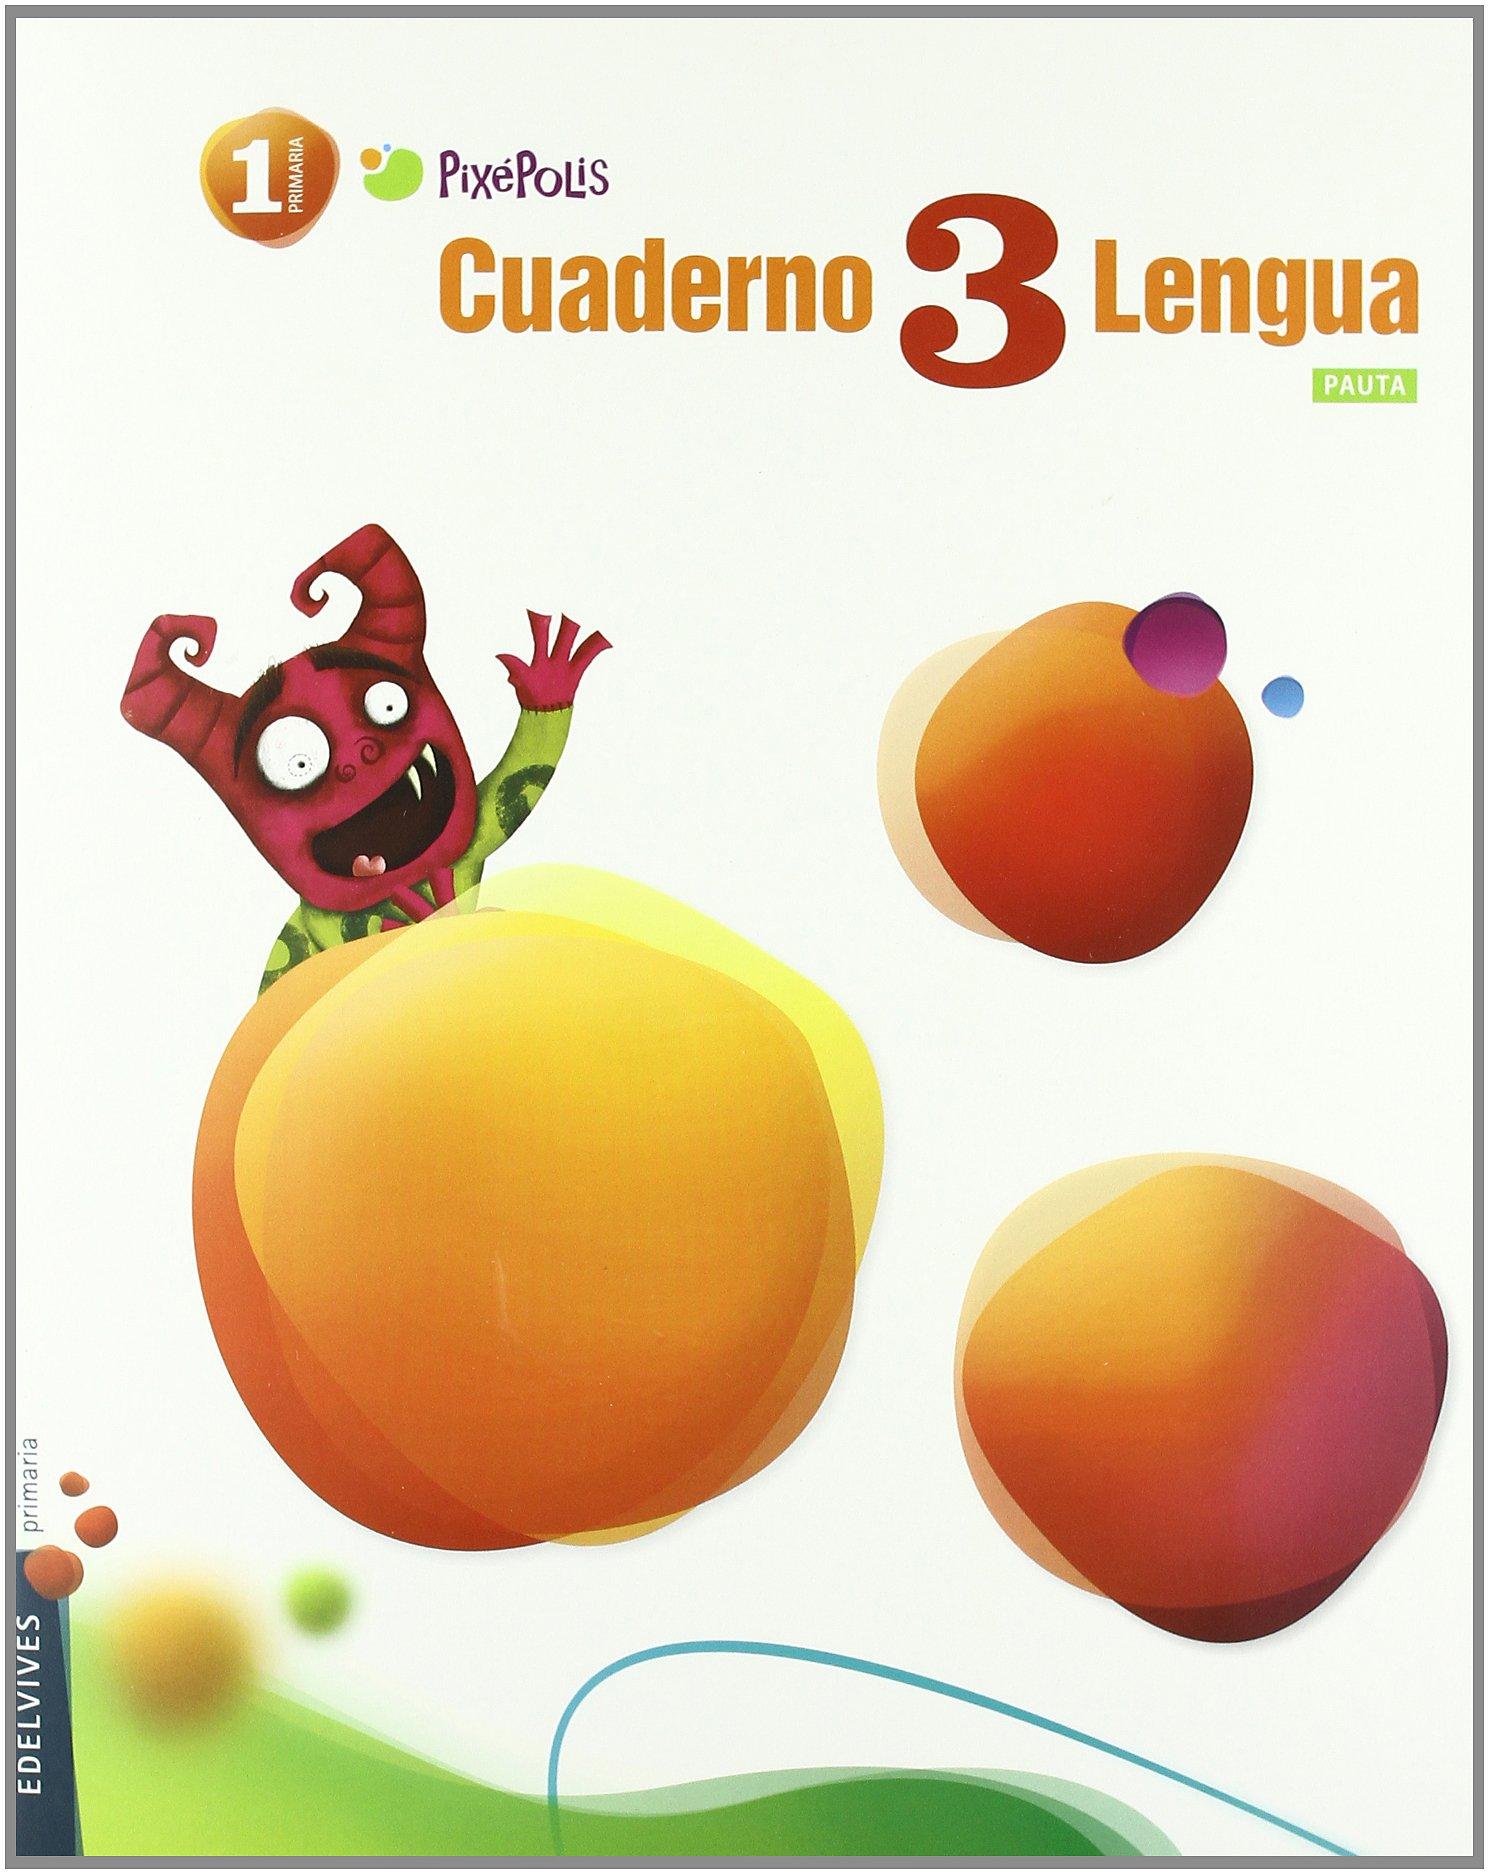 Cuaderno 3 Lengua / Workbook 3 Spanish Language: Primaria 1 / Elementary Grade 1 (Pixepolis) (Spanish Edition) pdf epub